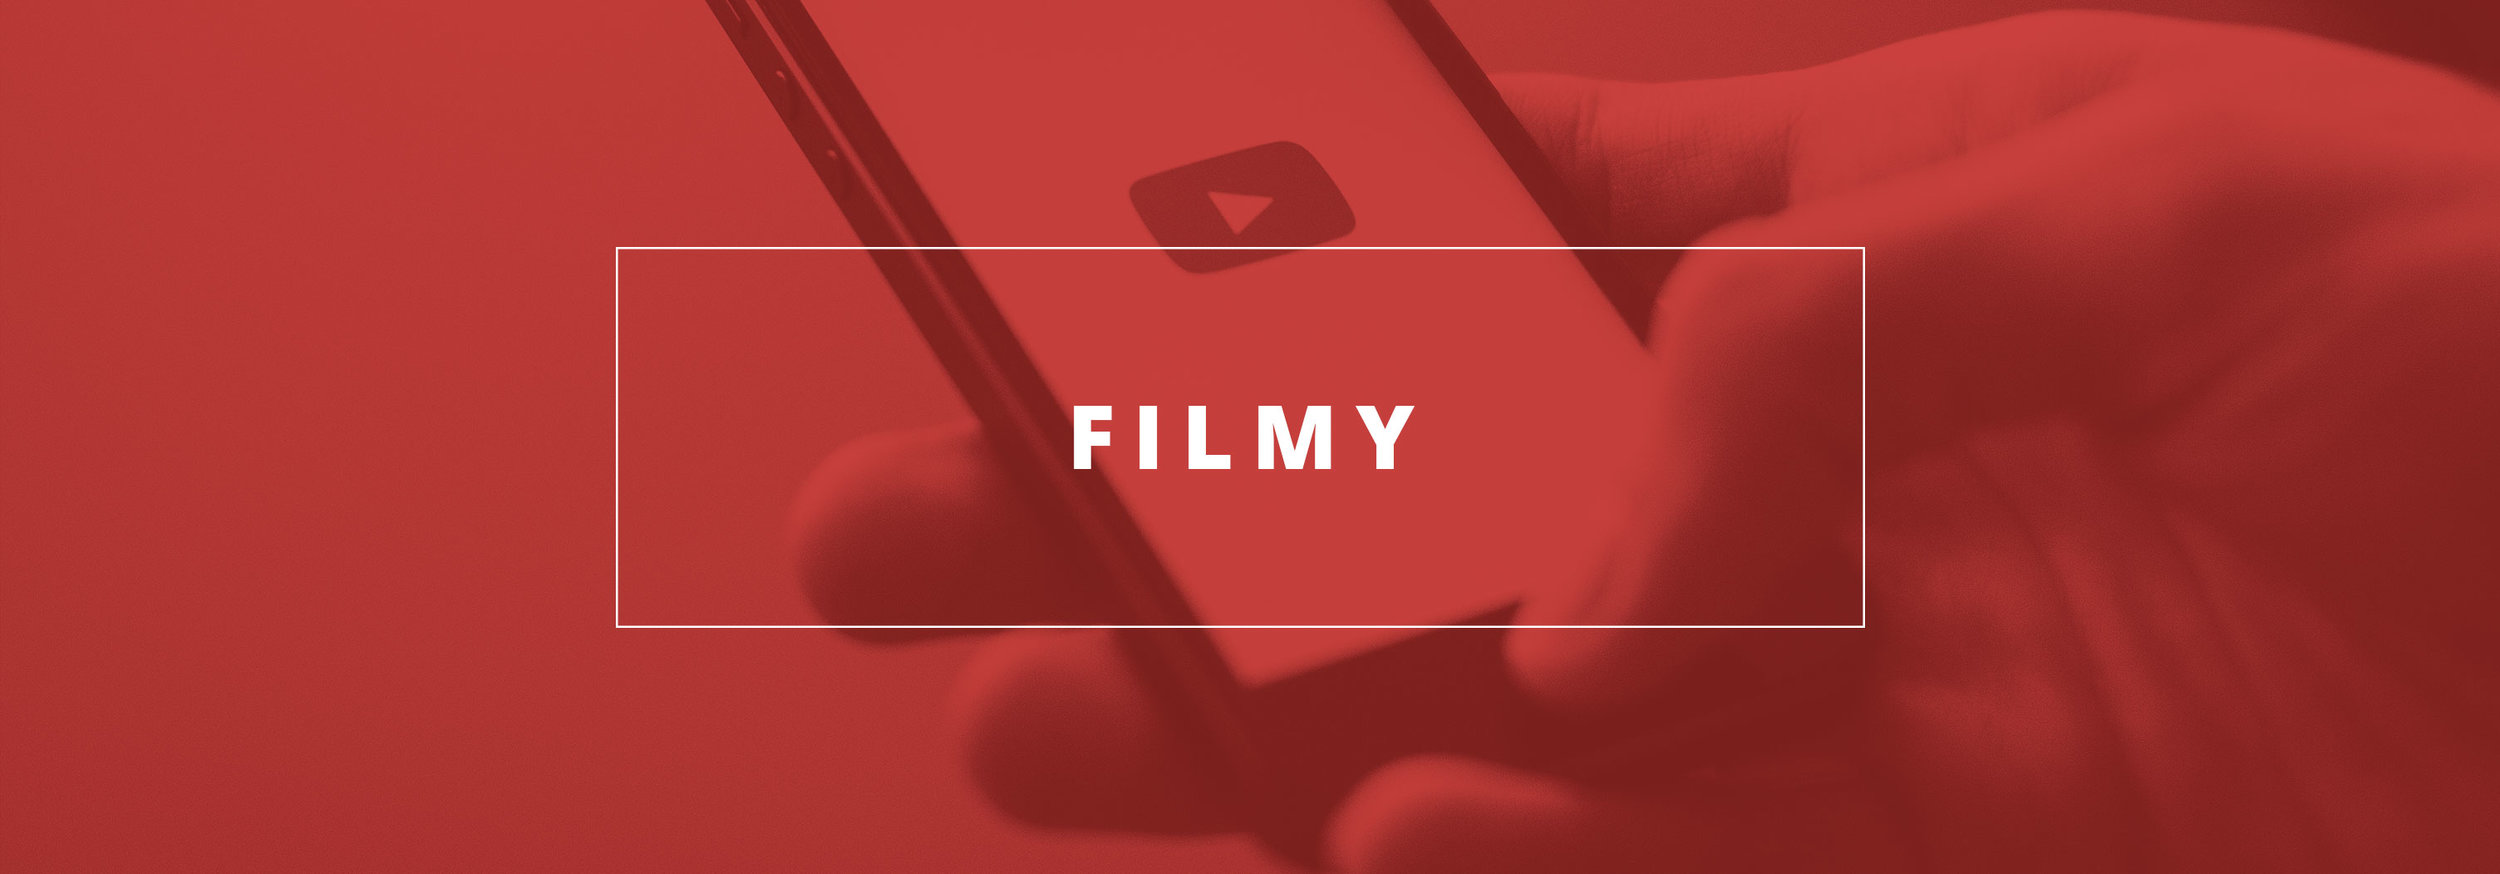 FILMY.jpg